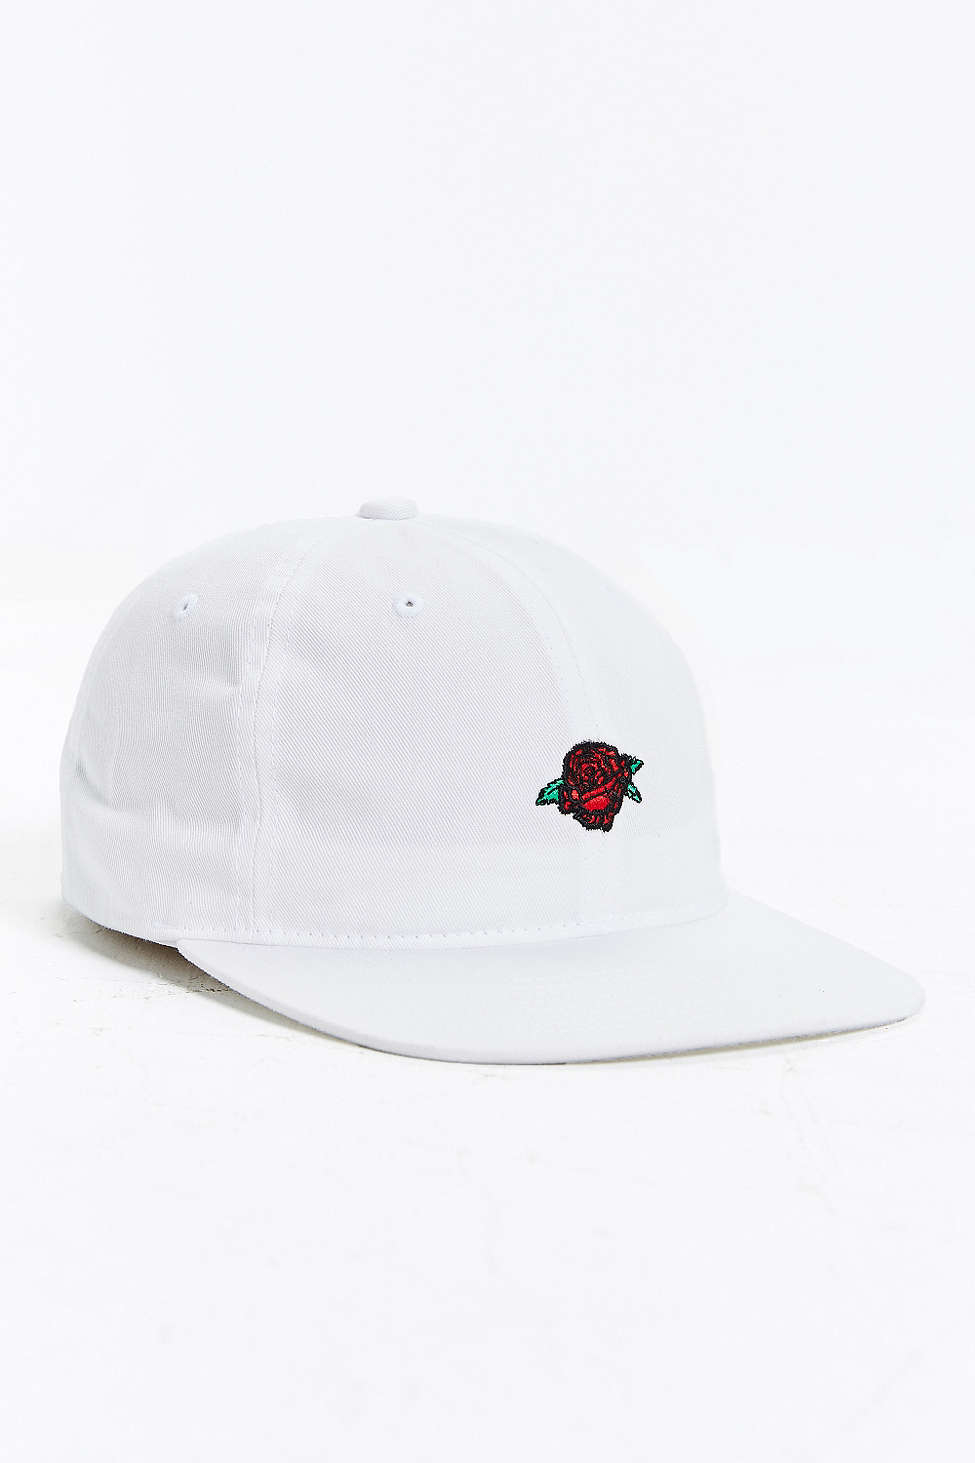 148d4e67b94 Lyst - Obey Rose Strapback Hat in White for Men